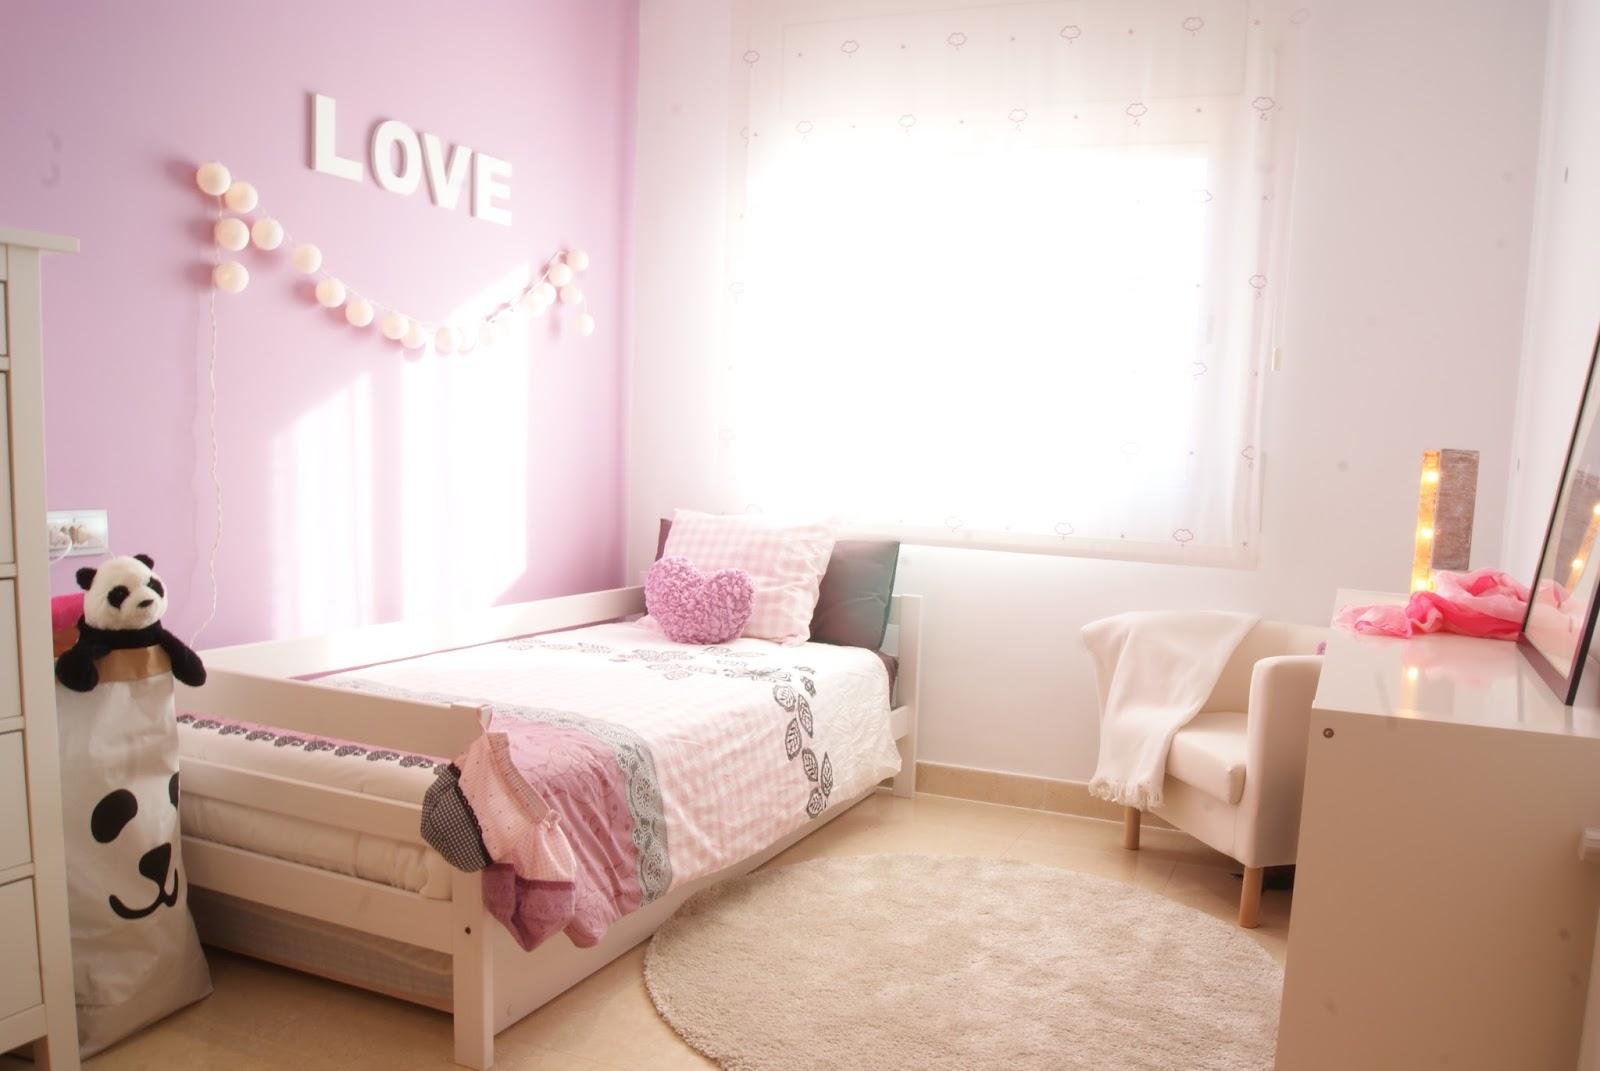 Zenna blog una habitaci n para una princesa - Habitacion pequena nina ...